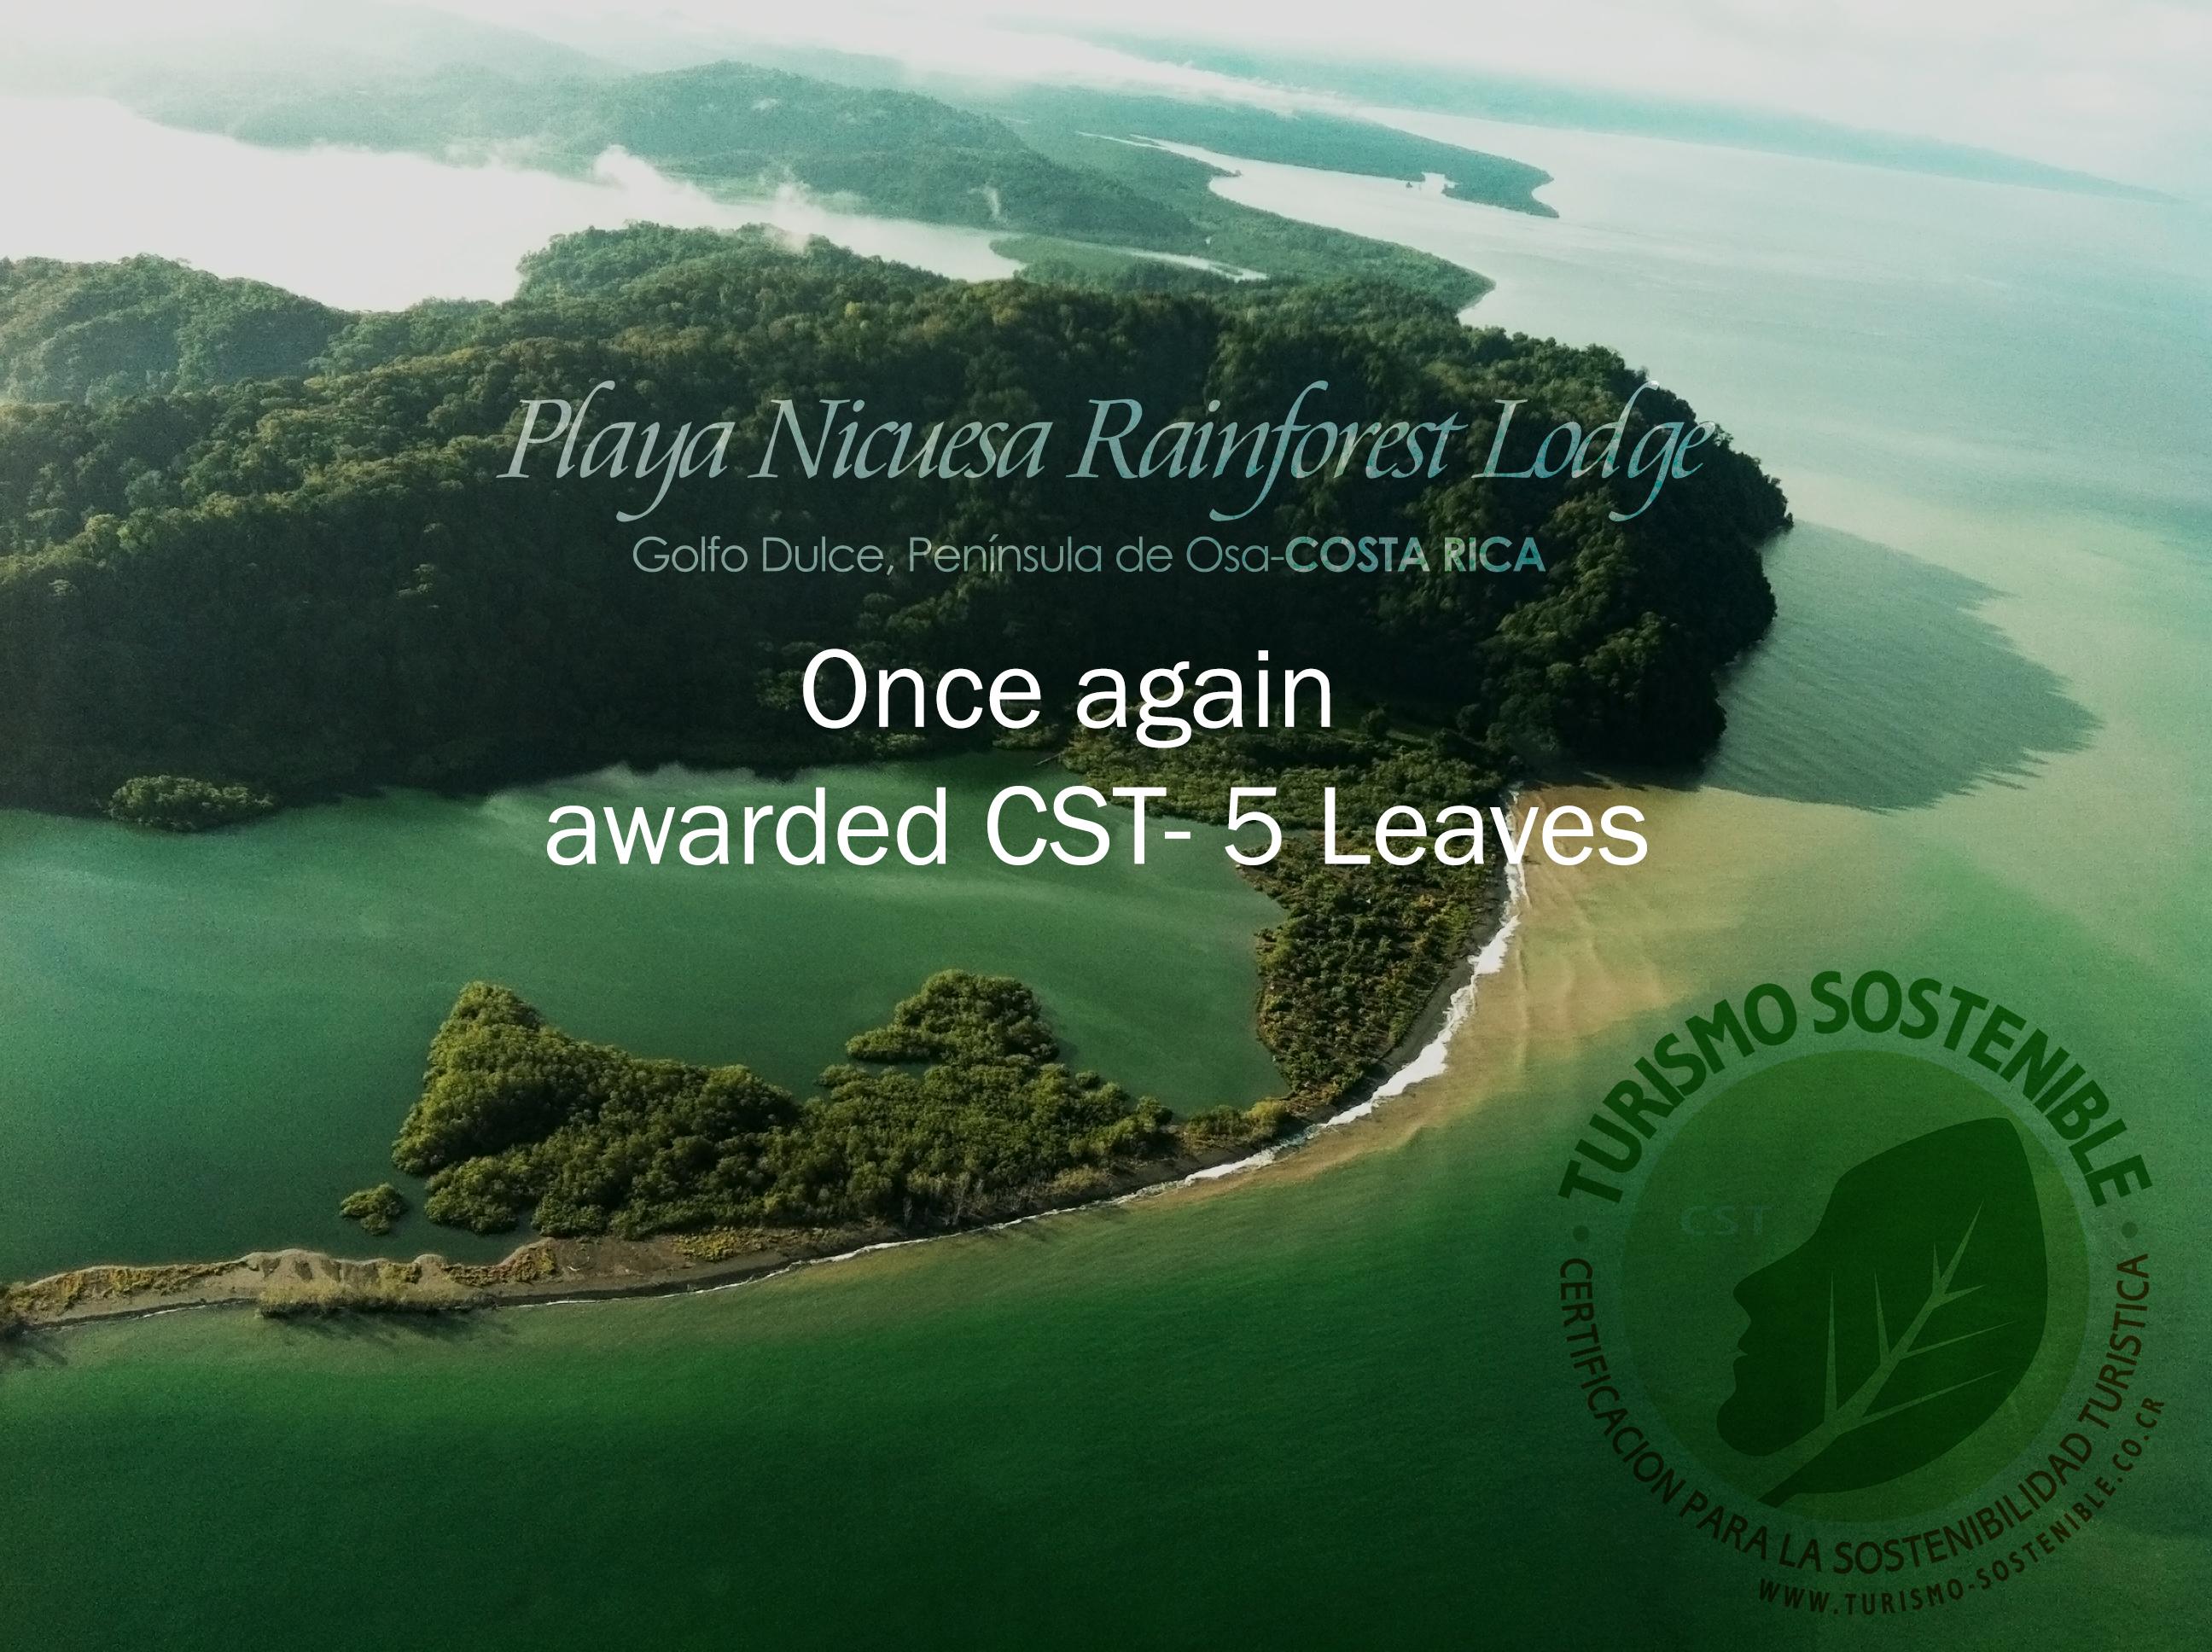 CST- 5 leaf program